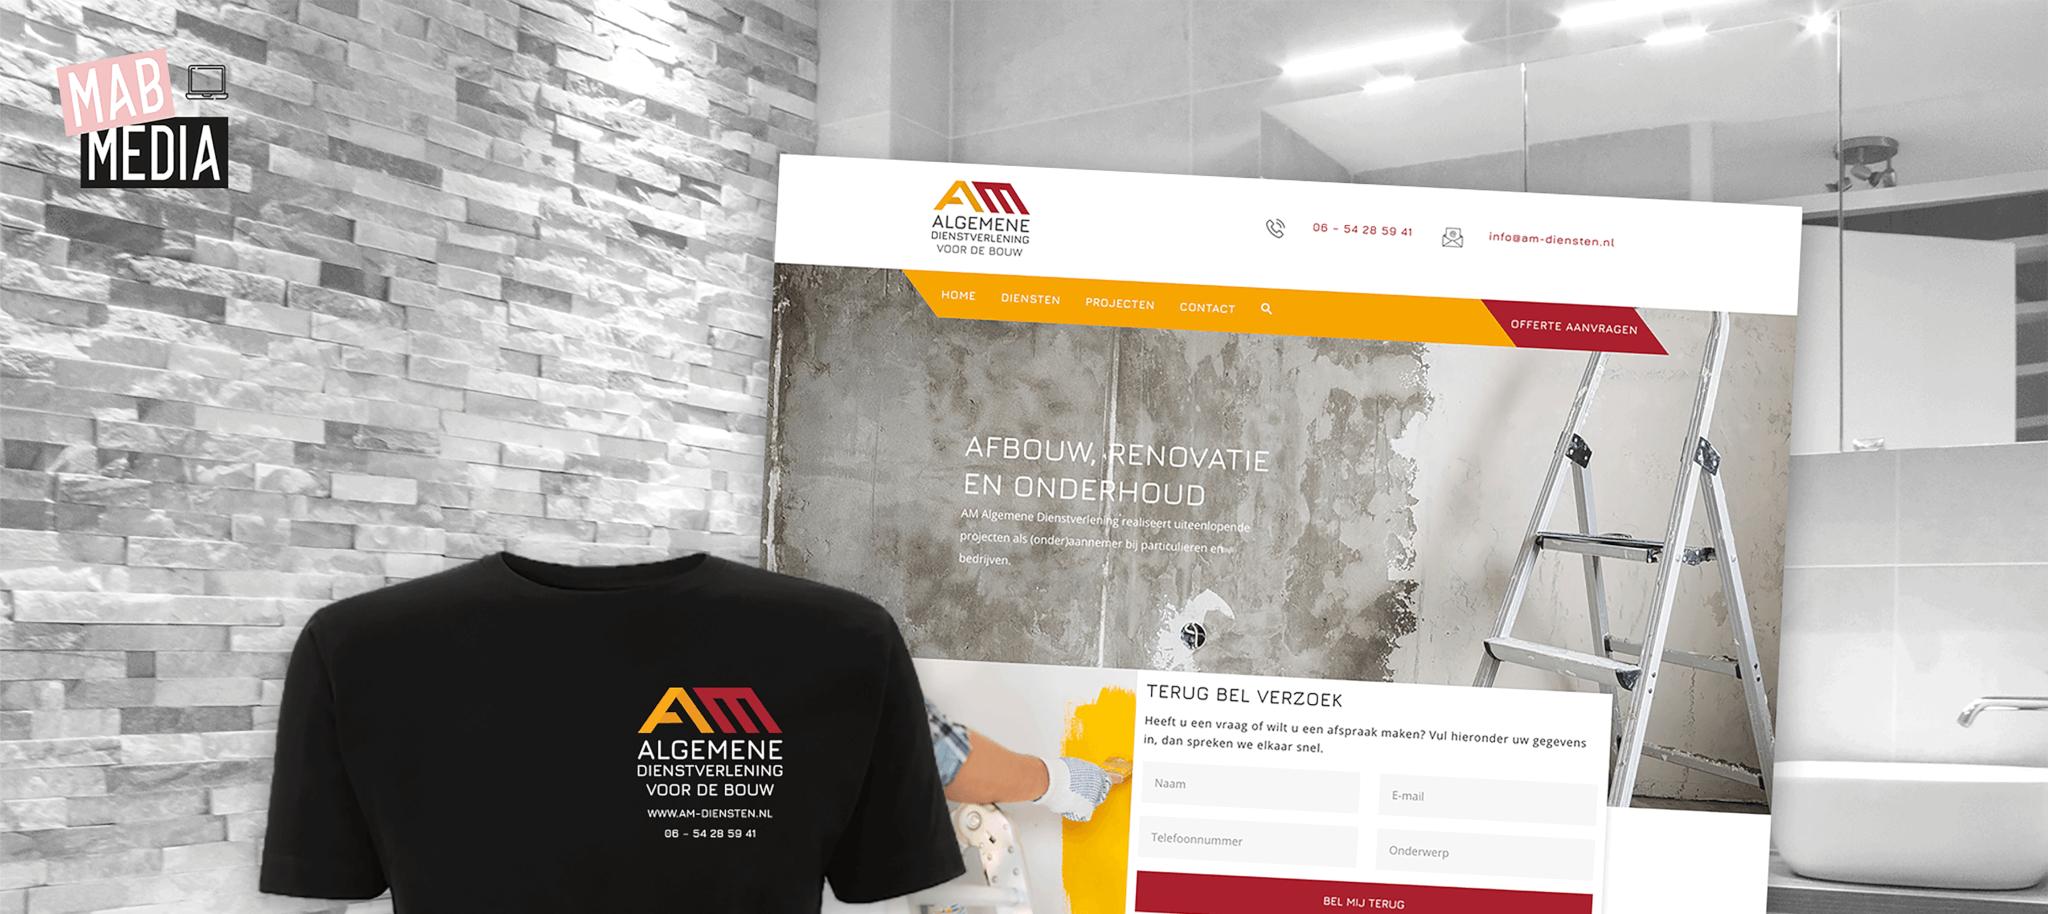 MAB Media Project AM Algemene Dienstverlening nieuwe website en huisstijl